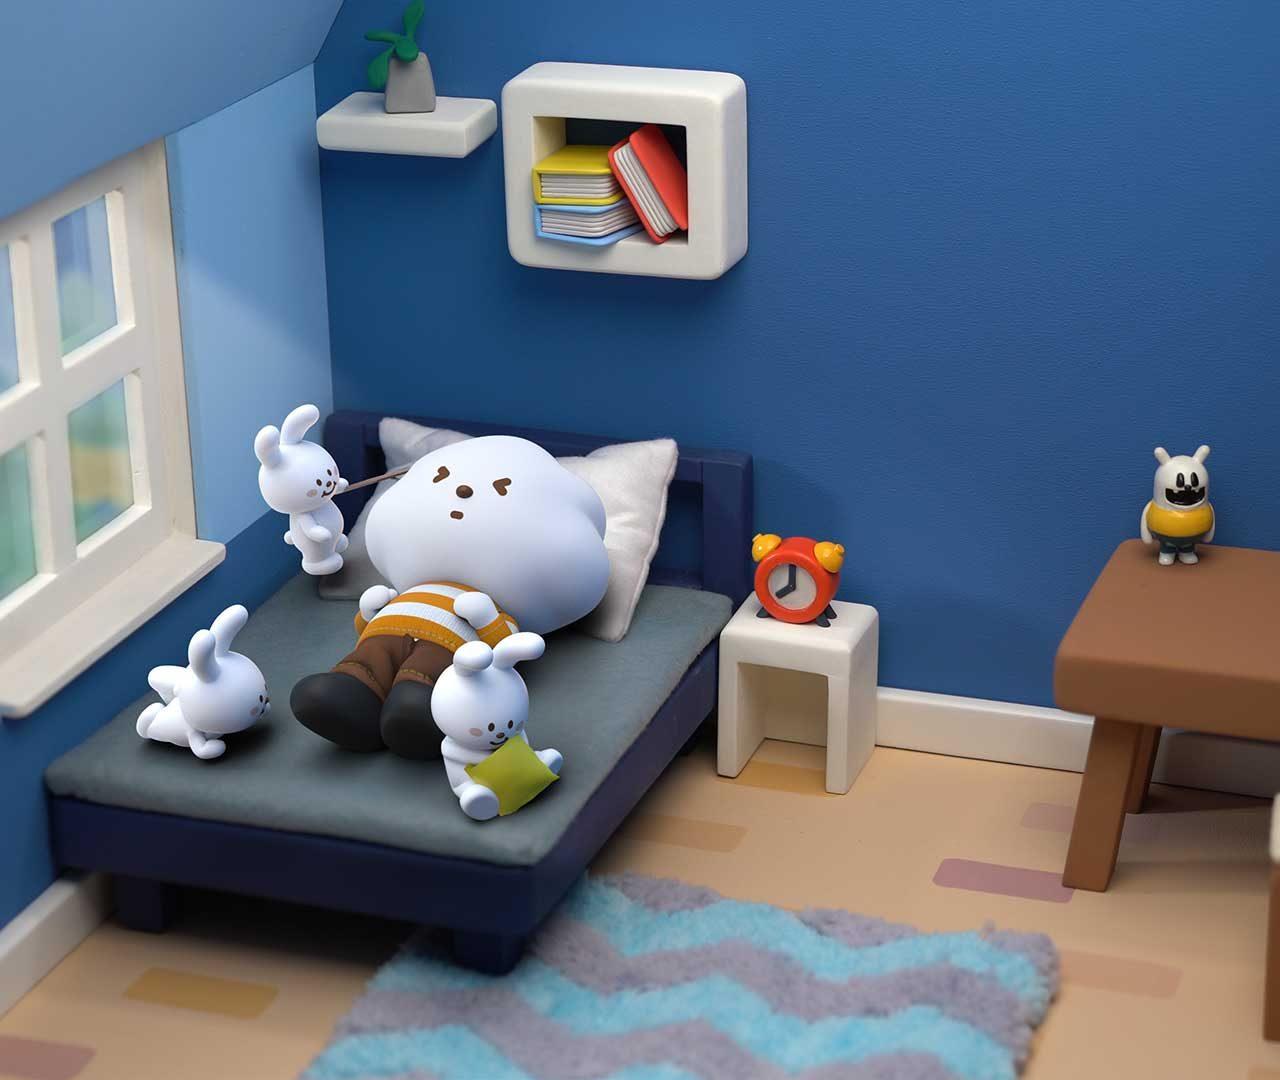 MR-WHITE-CLOUD-BEDROOM-SCENE